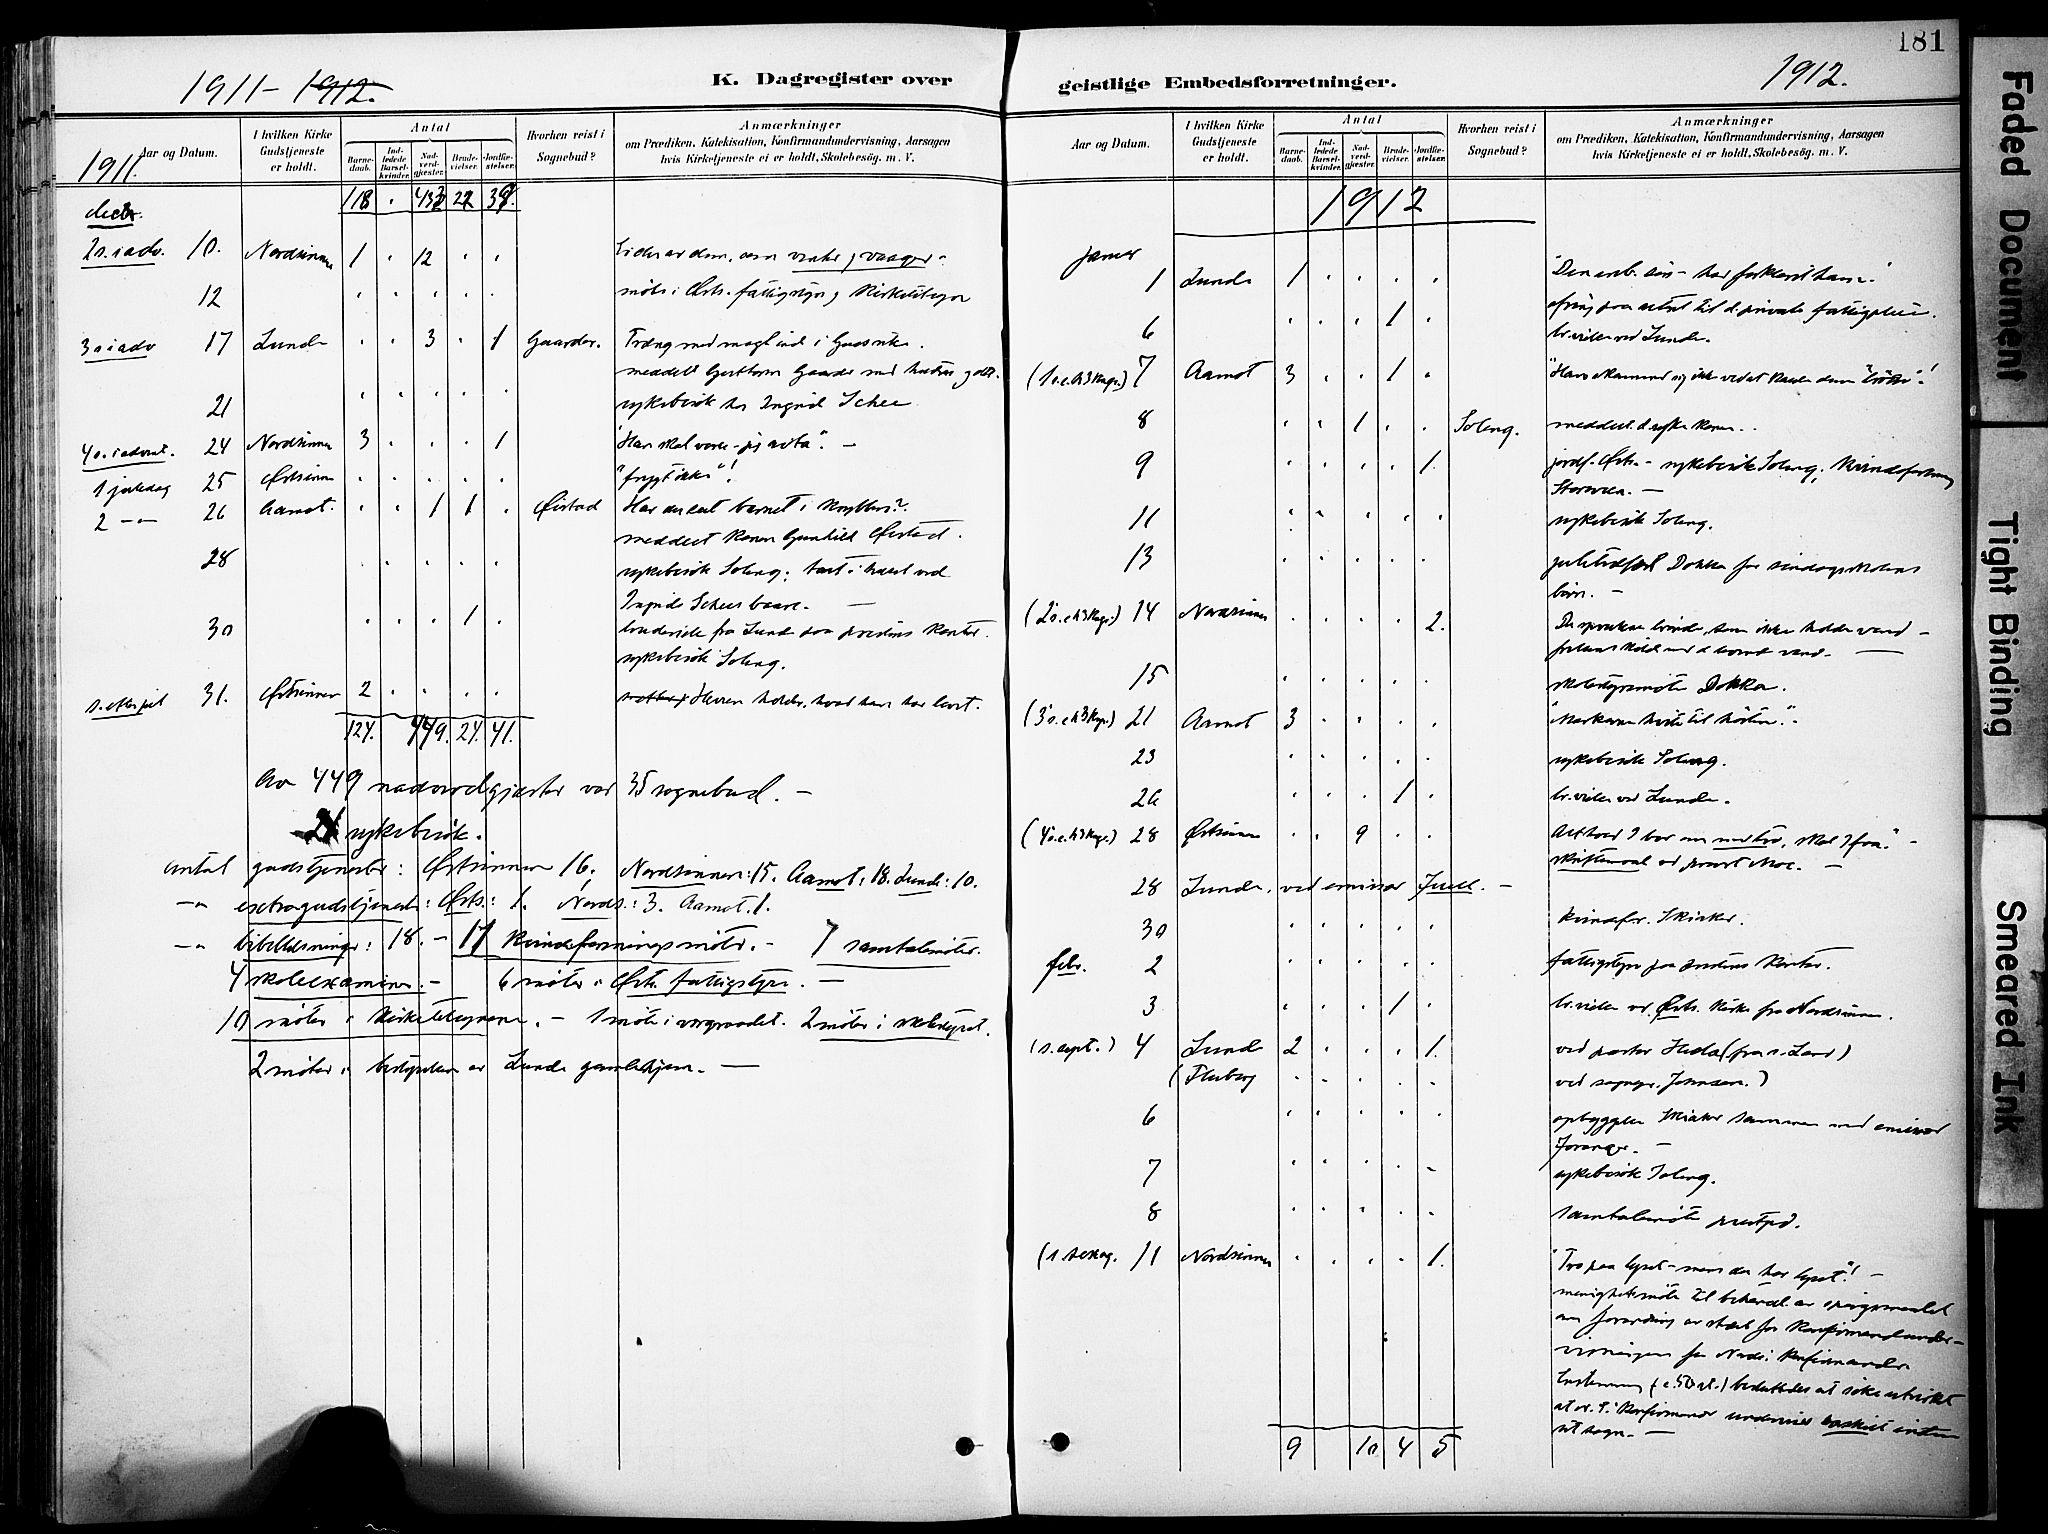 SAH, Nordre Land prestekontor, Ministerialbok nr. 6, 1897-1914, s. 181